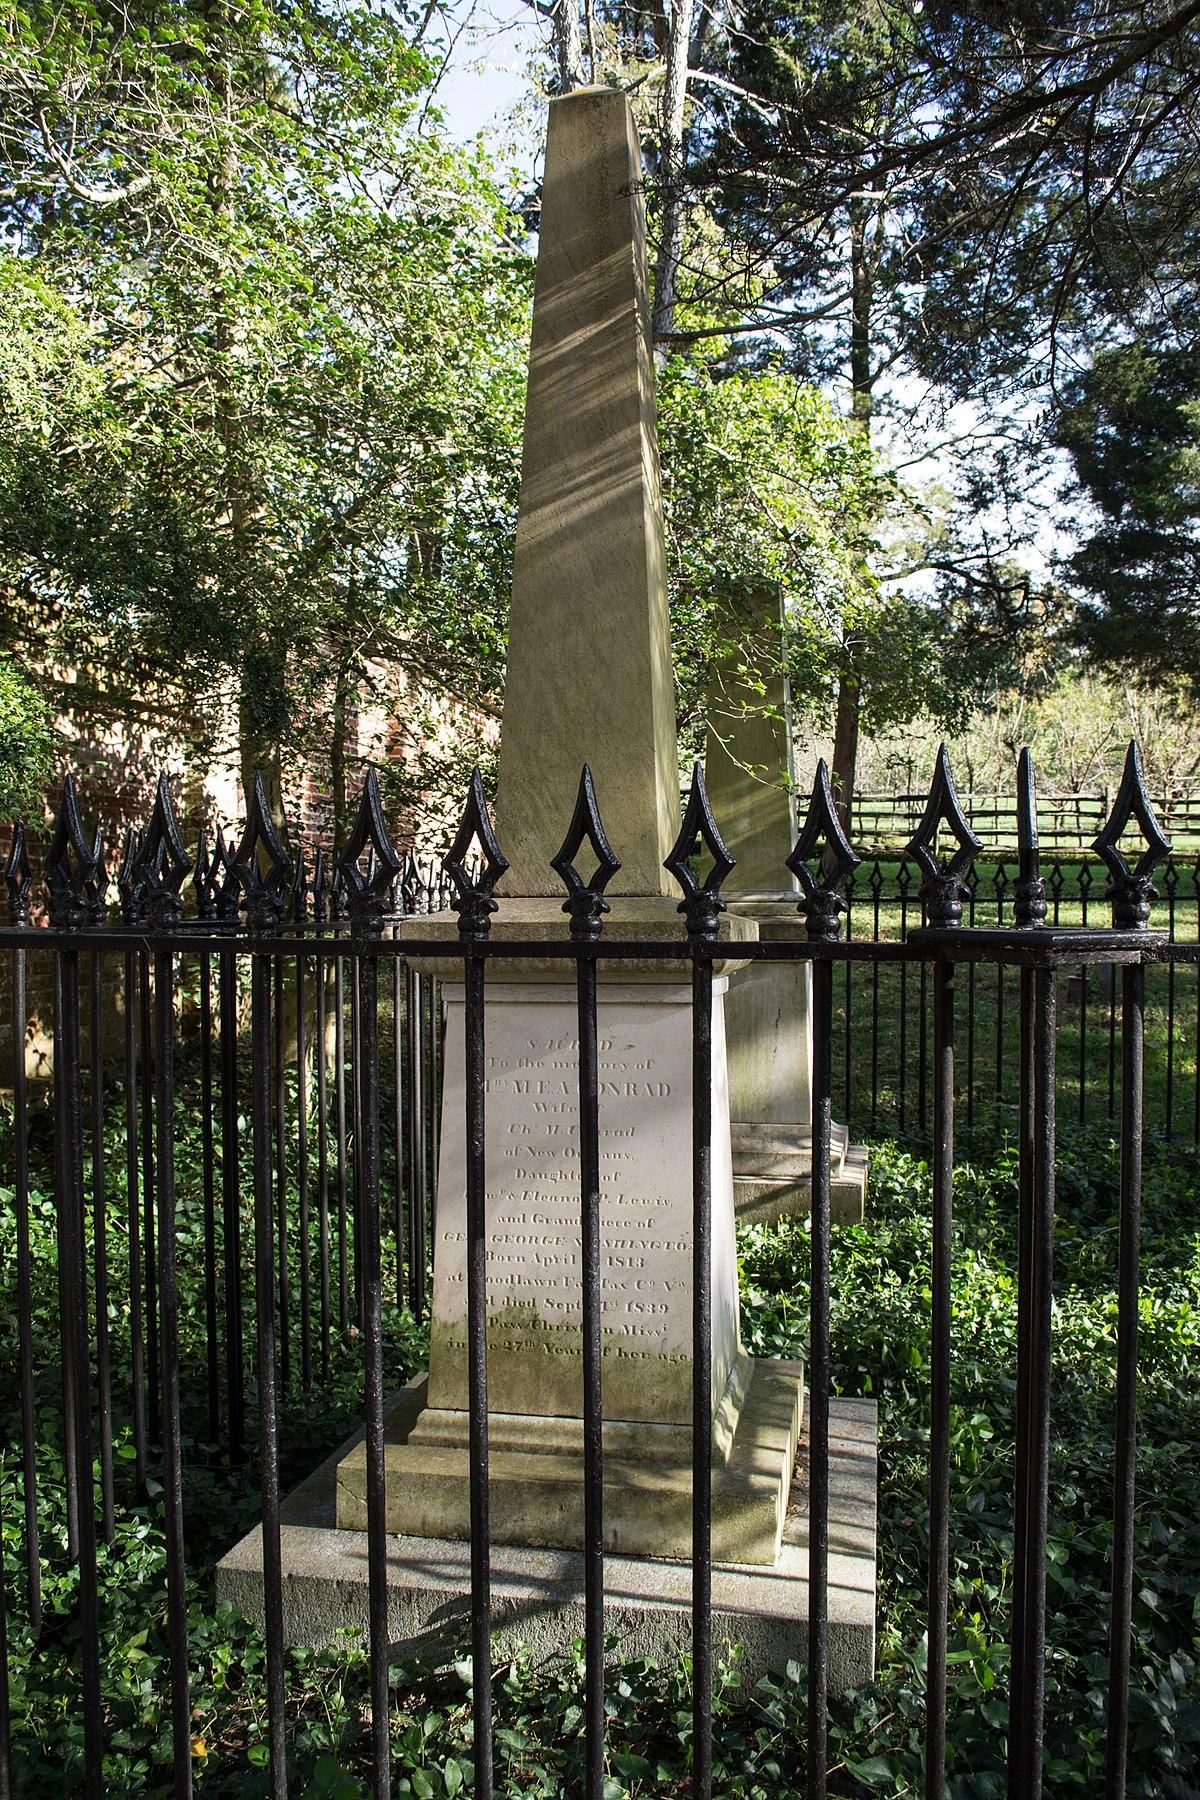 Angela Lewis Wikipedia file:mary eliza angela lewis conrad grave - front - mount